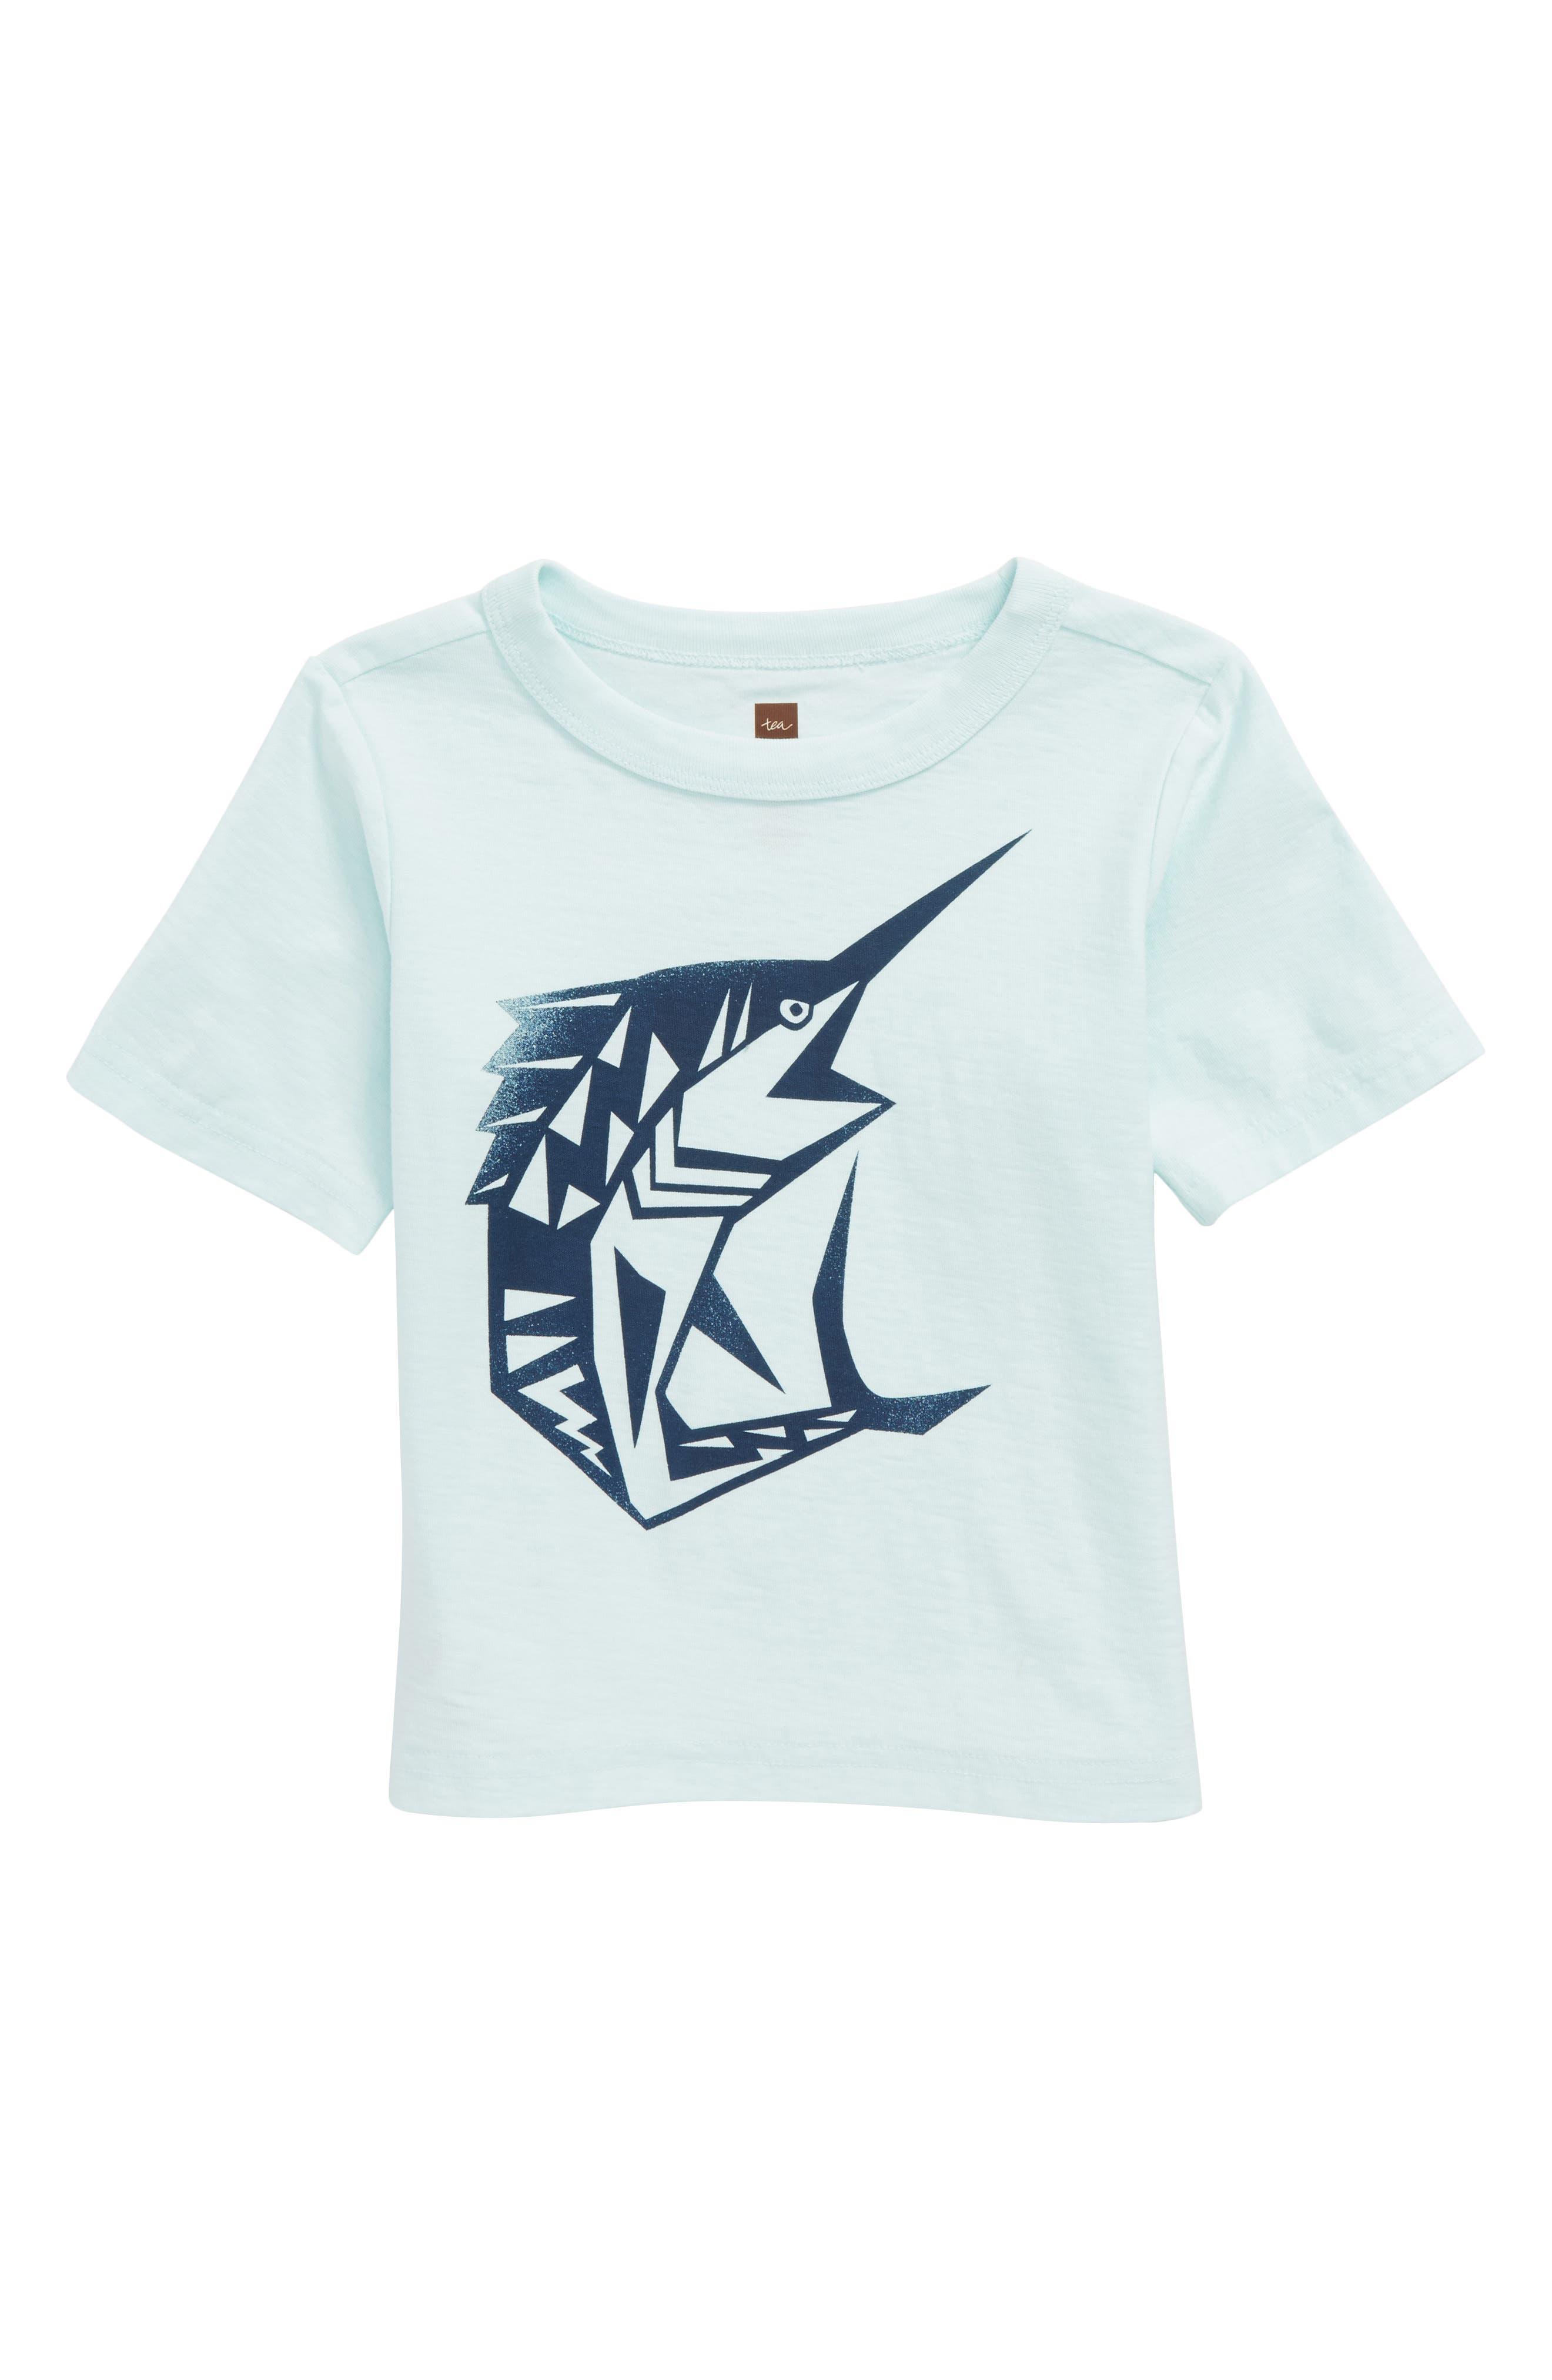 Swordfish T-Shirt,                         Main,                         color, Key Blue